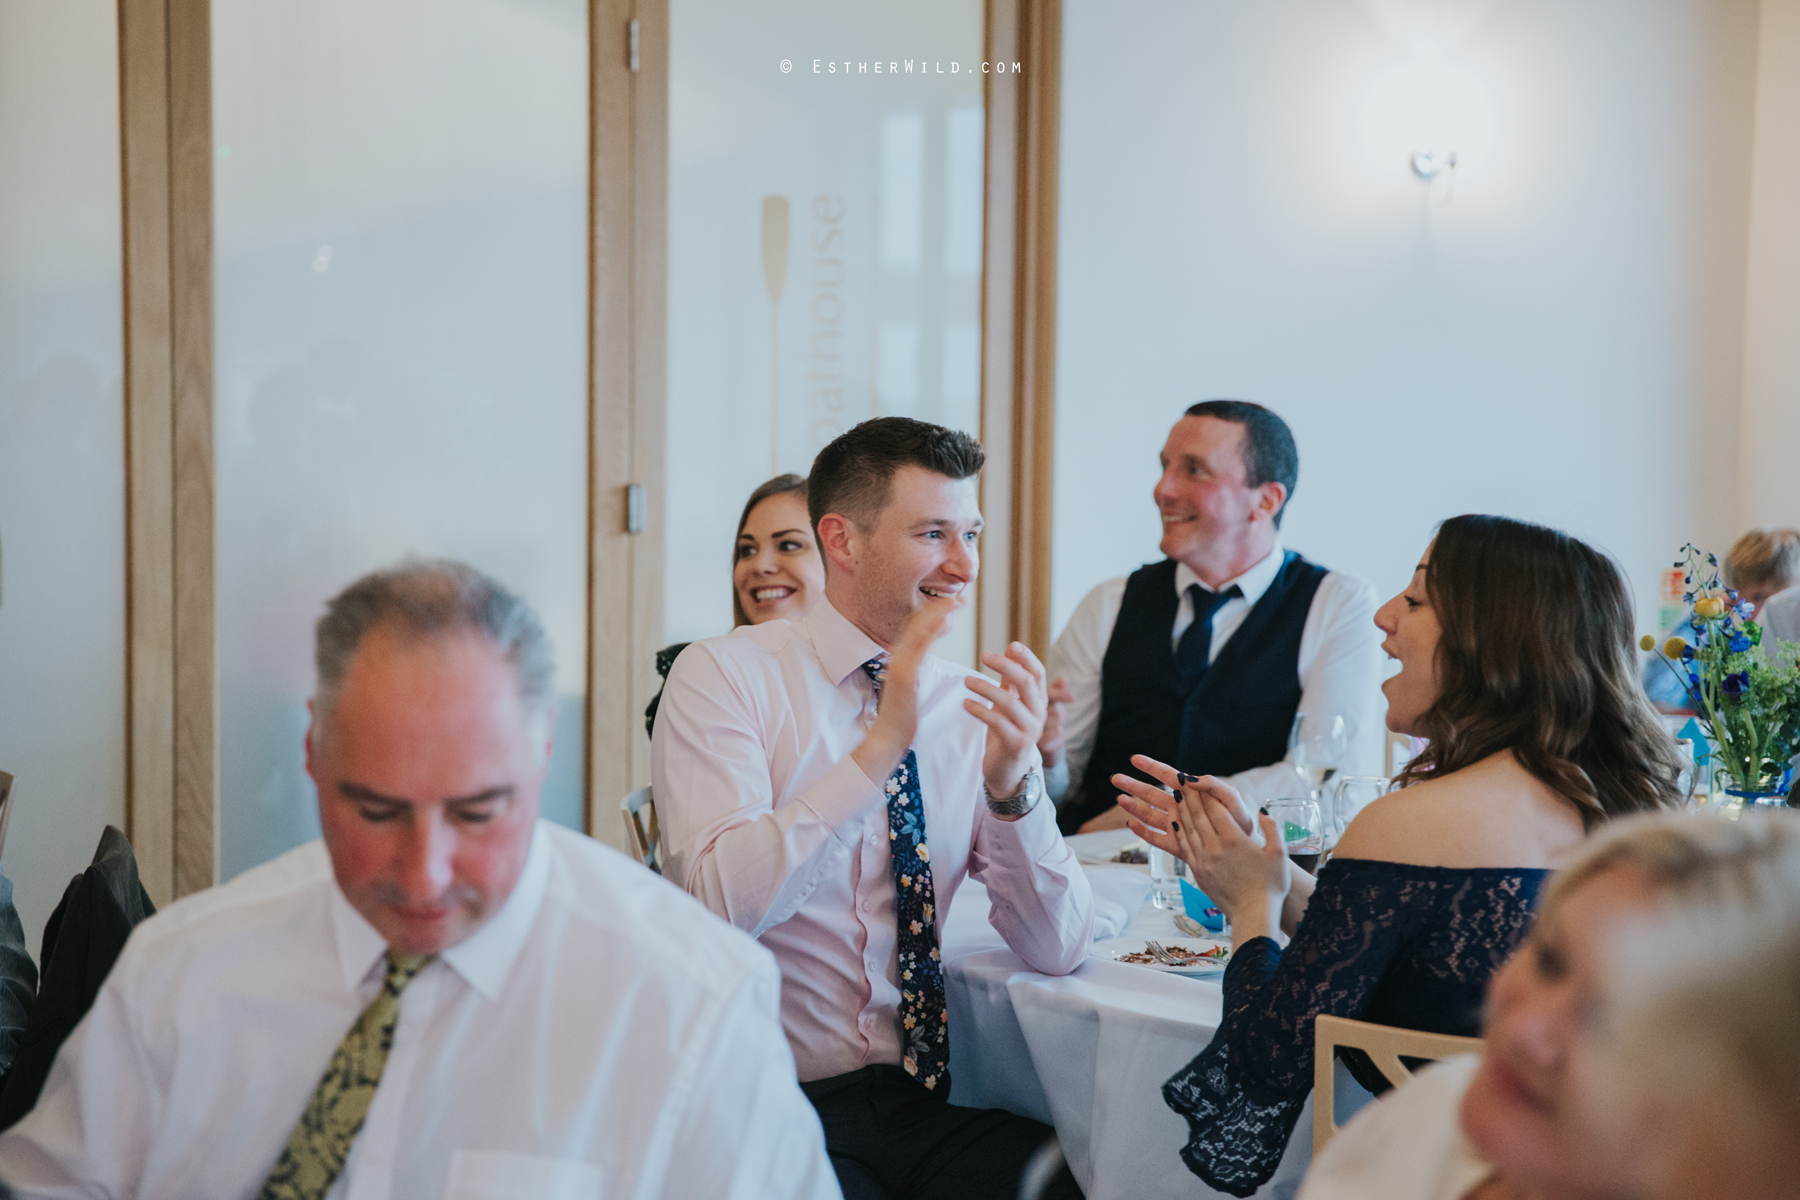 The_BoatHouse_Wedding_Venue_Ormesby_Norfolk_Broads_Boat_Wedding_Photography_Esther_Wild_Photographer_IMG_2321.jpg